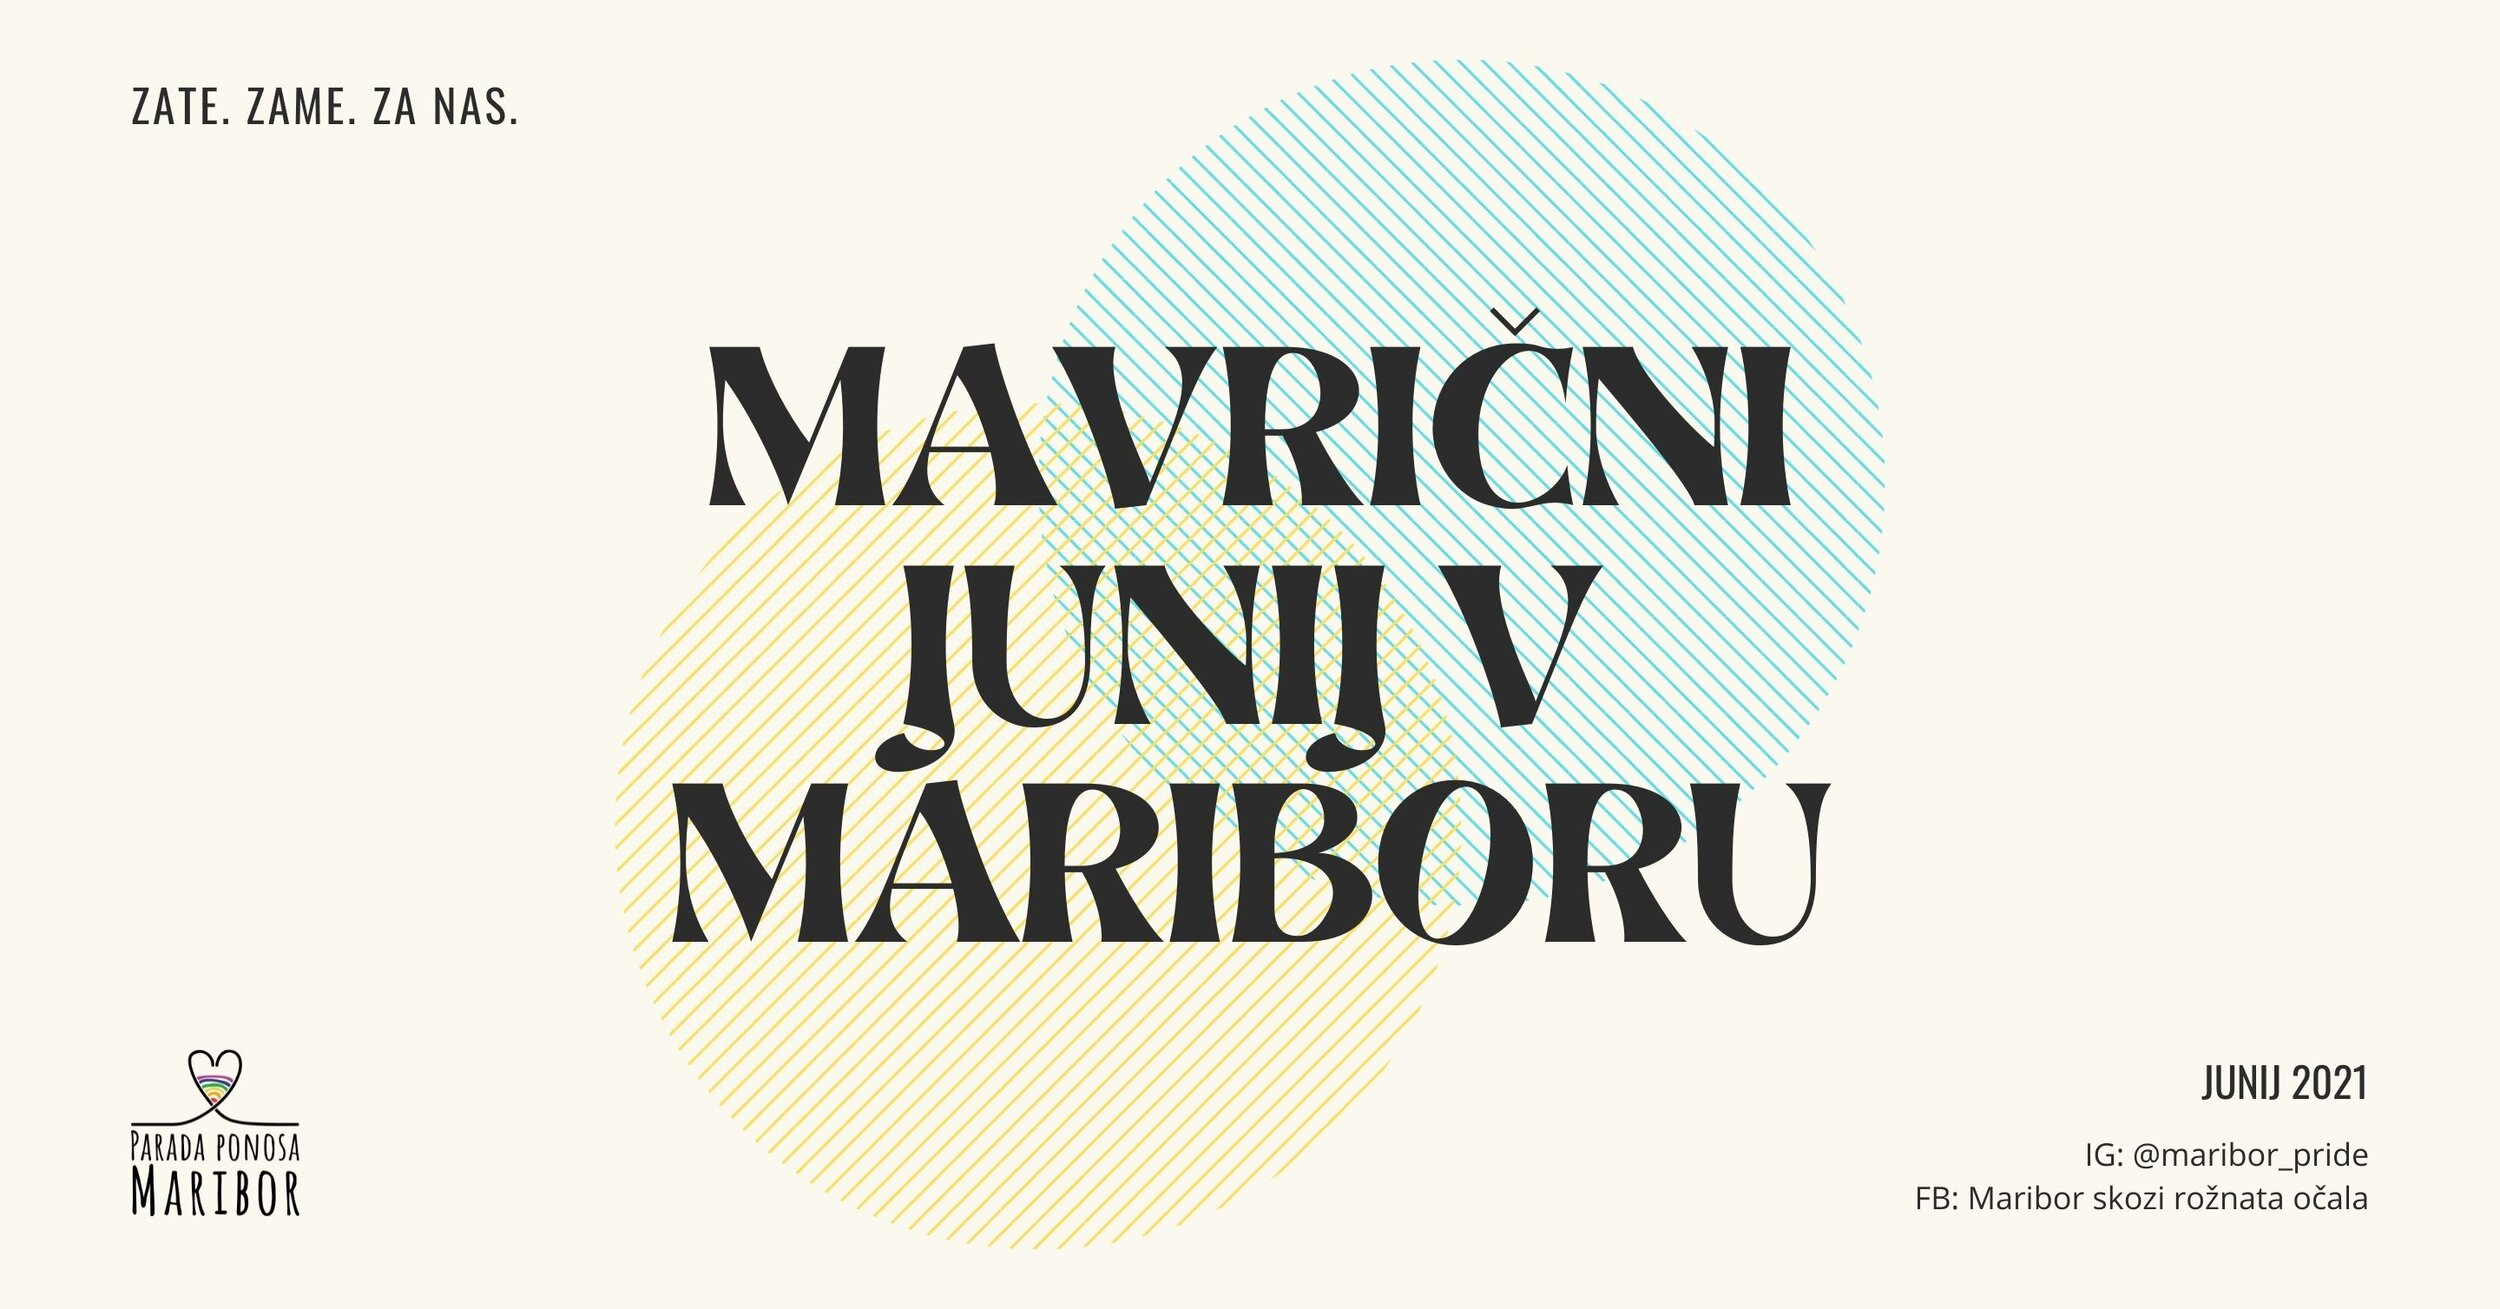 Mavricni junij v MB - FB.jpg